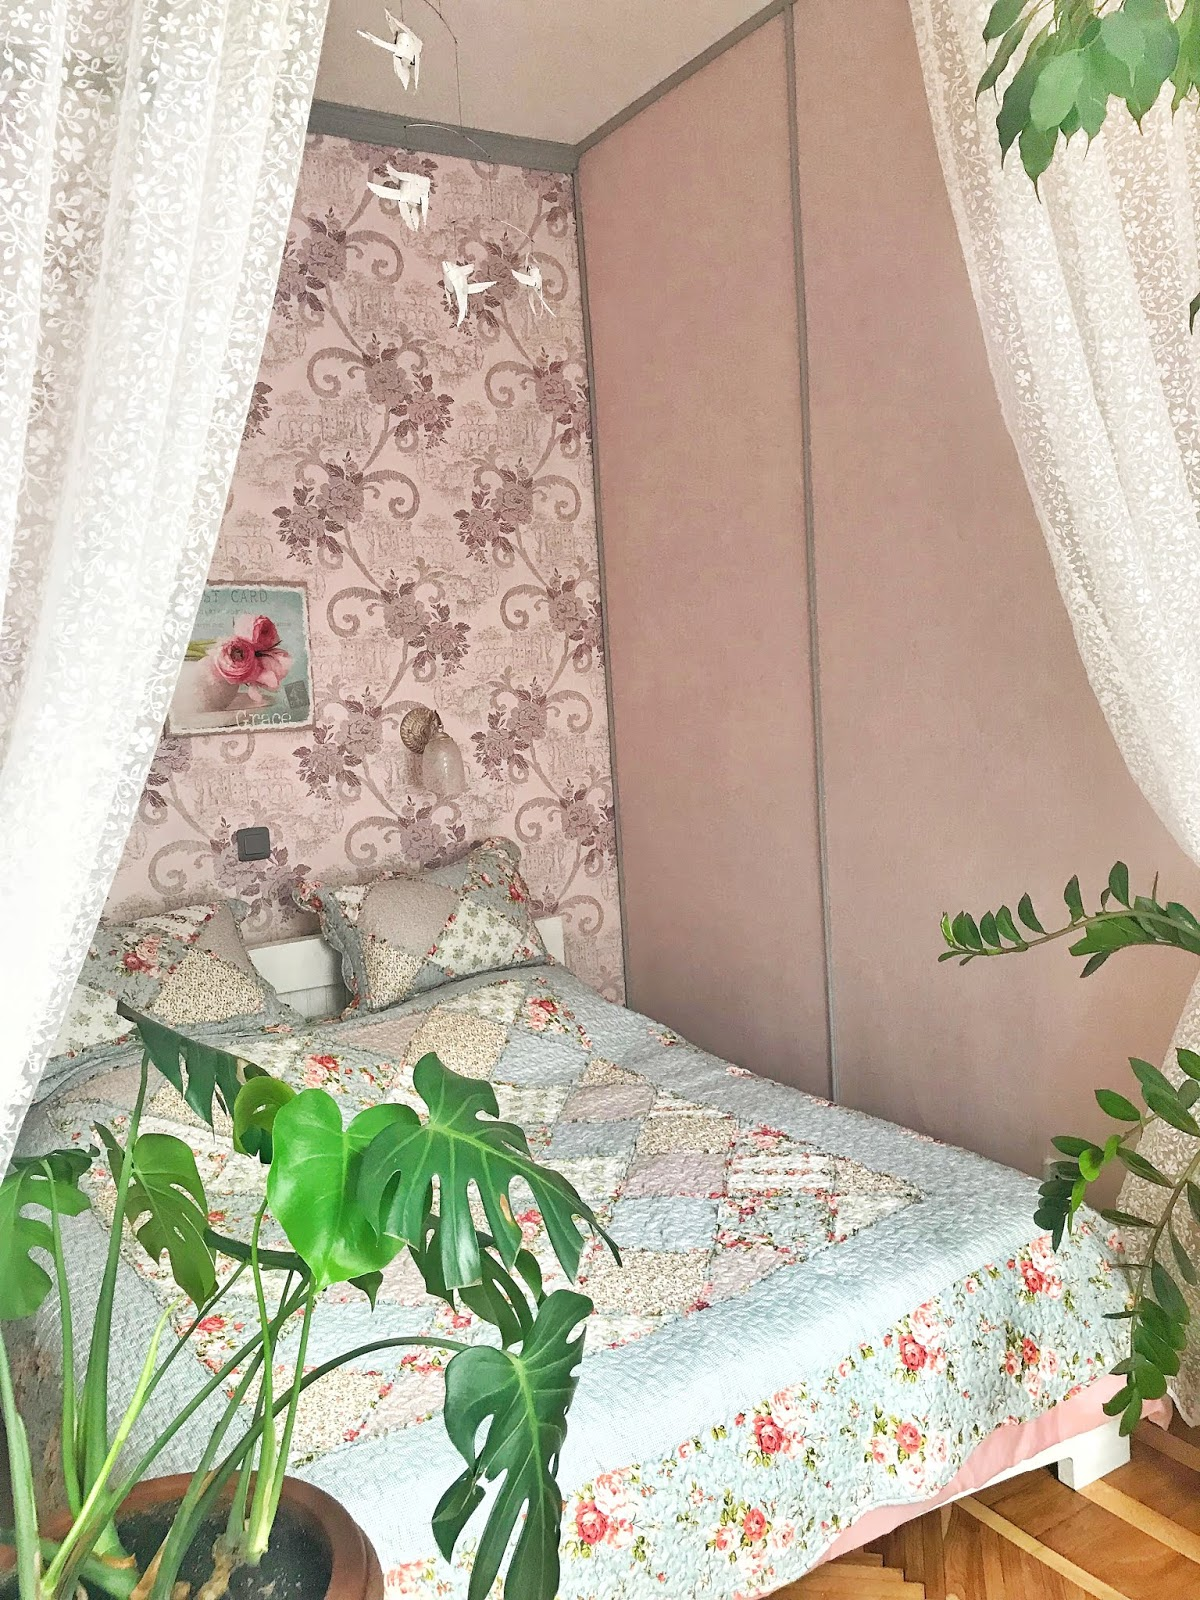 russia airbnb st petersburg